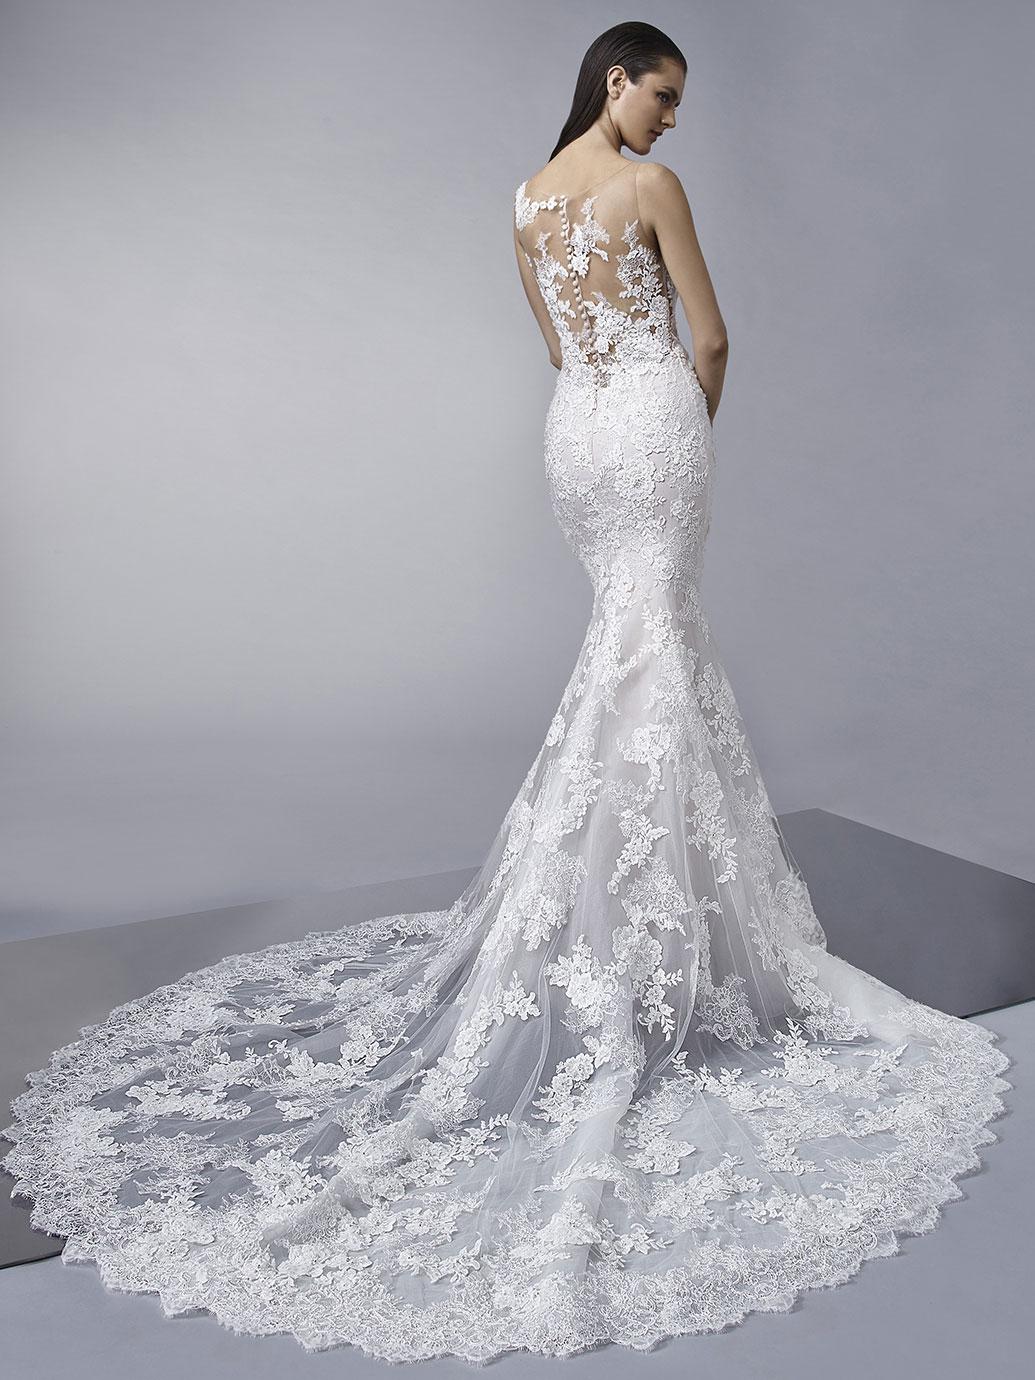 Enzoani Wedding Dress sheer top wedding dress long tail mermaid wedding dress